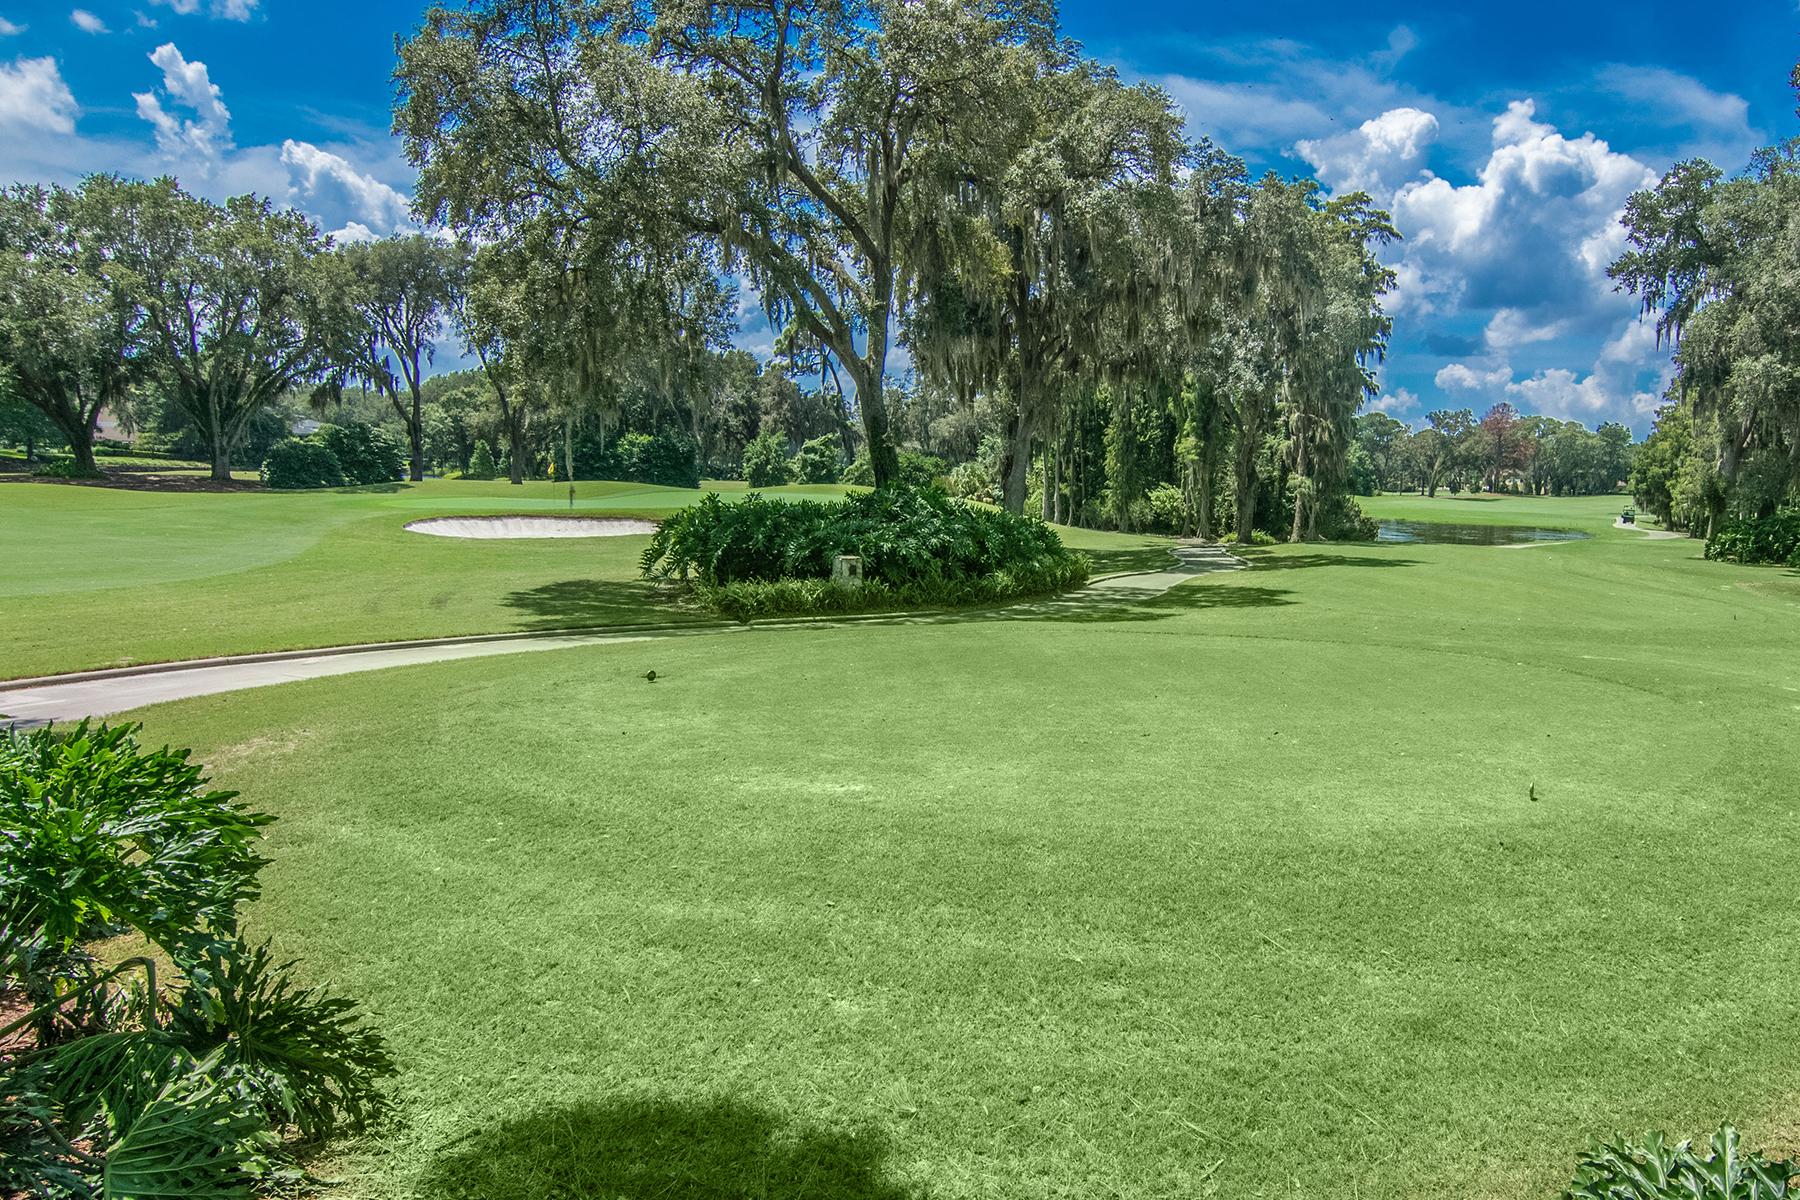 Land for Sale at LUTZ 16908 Villalagos De Avila, Lutz, Florida 33548 United States